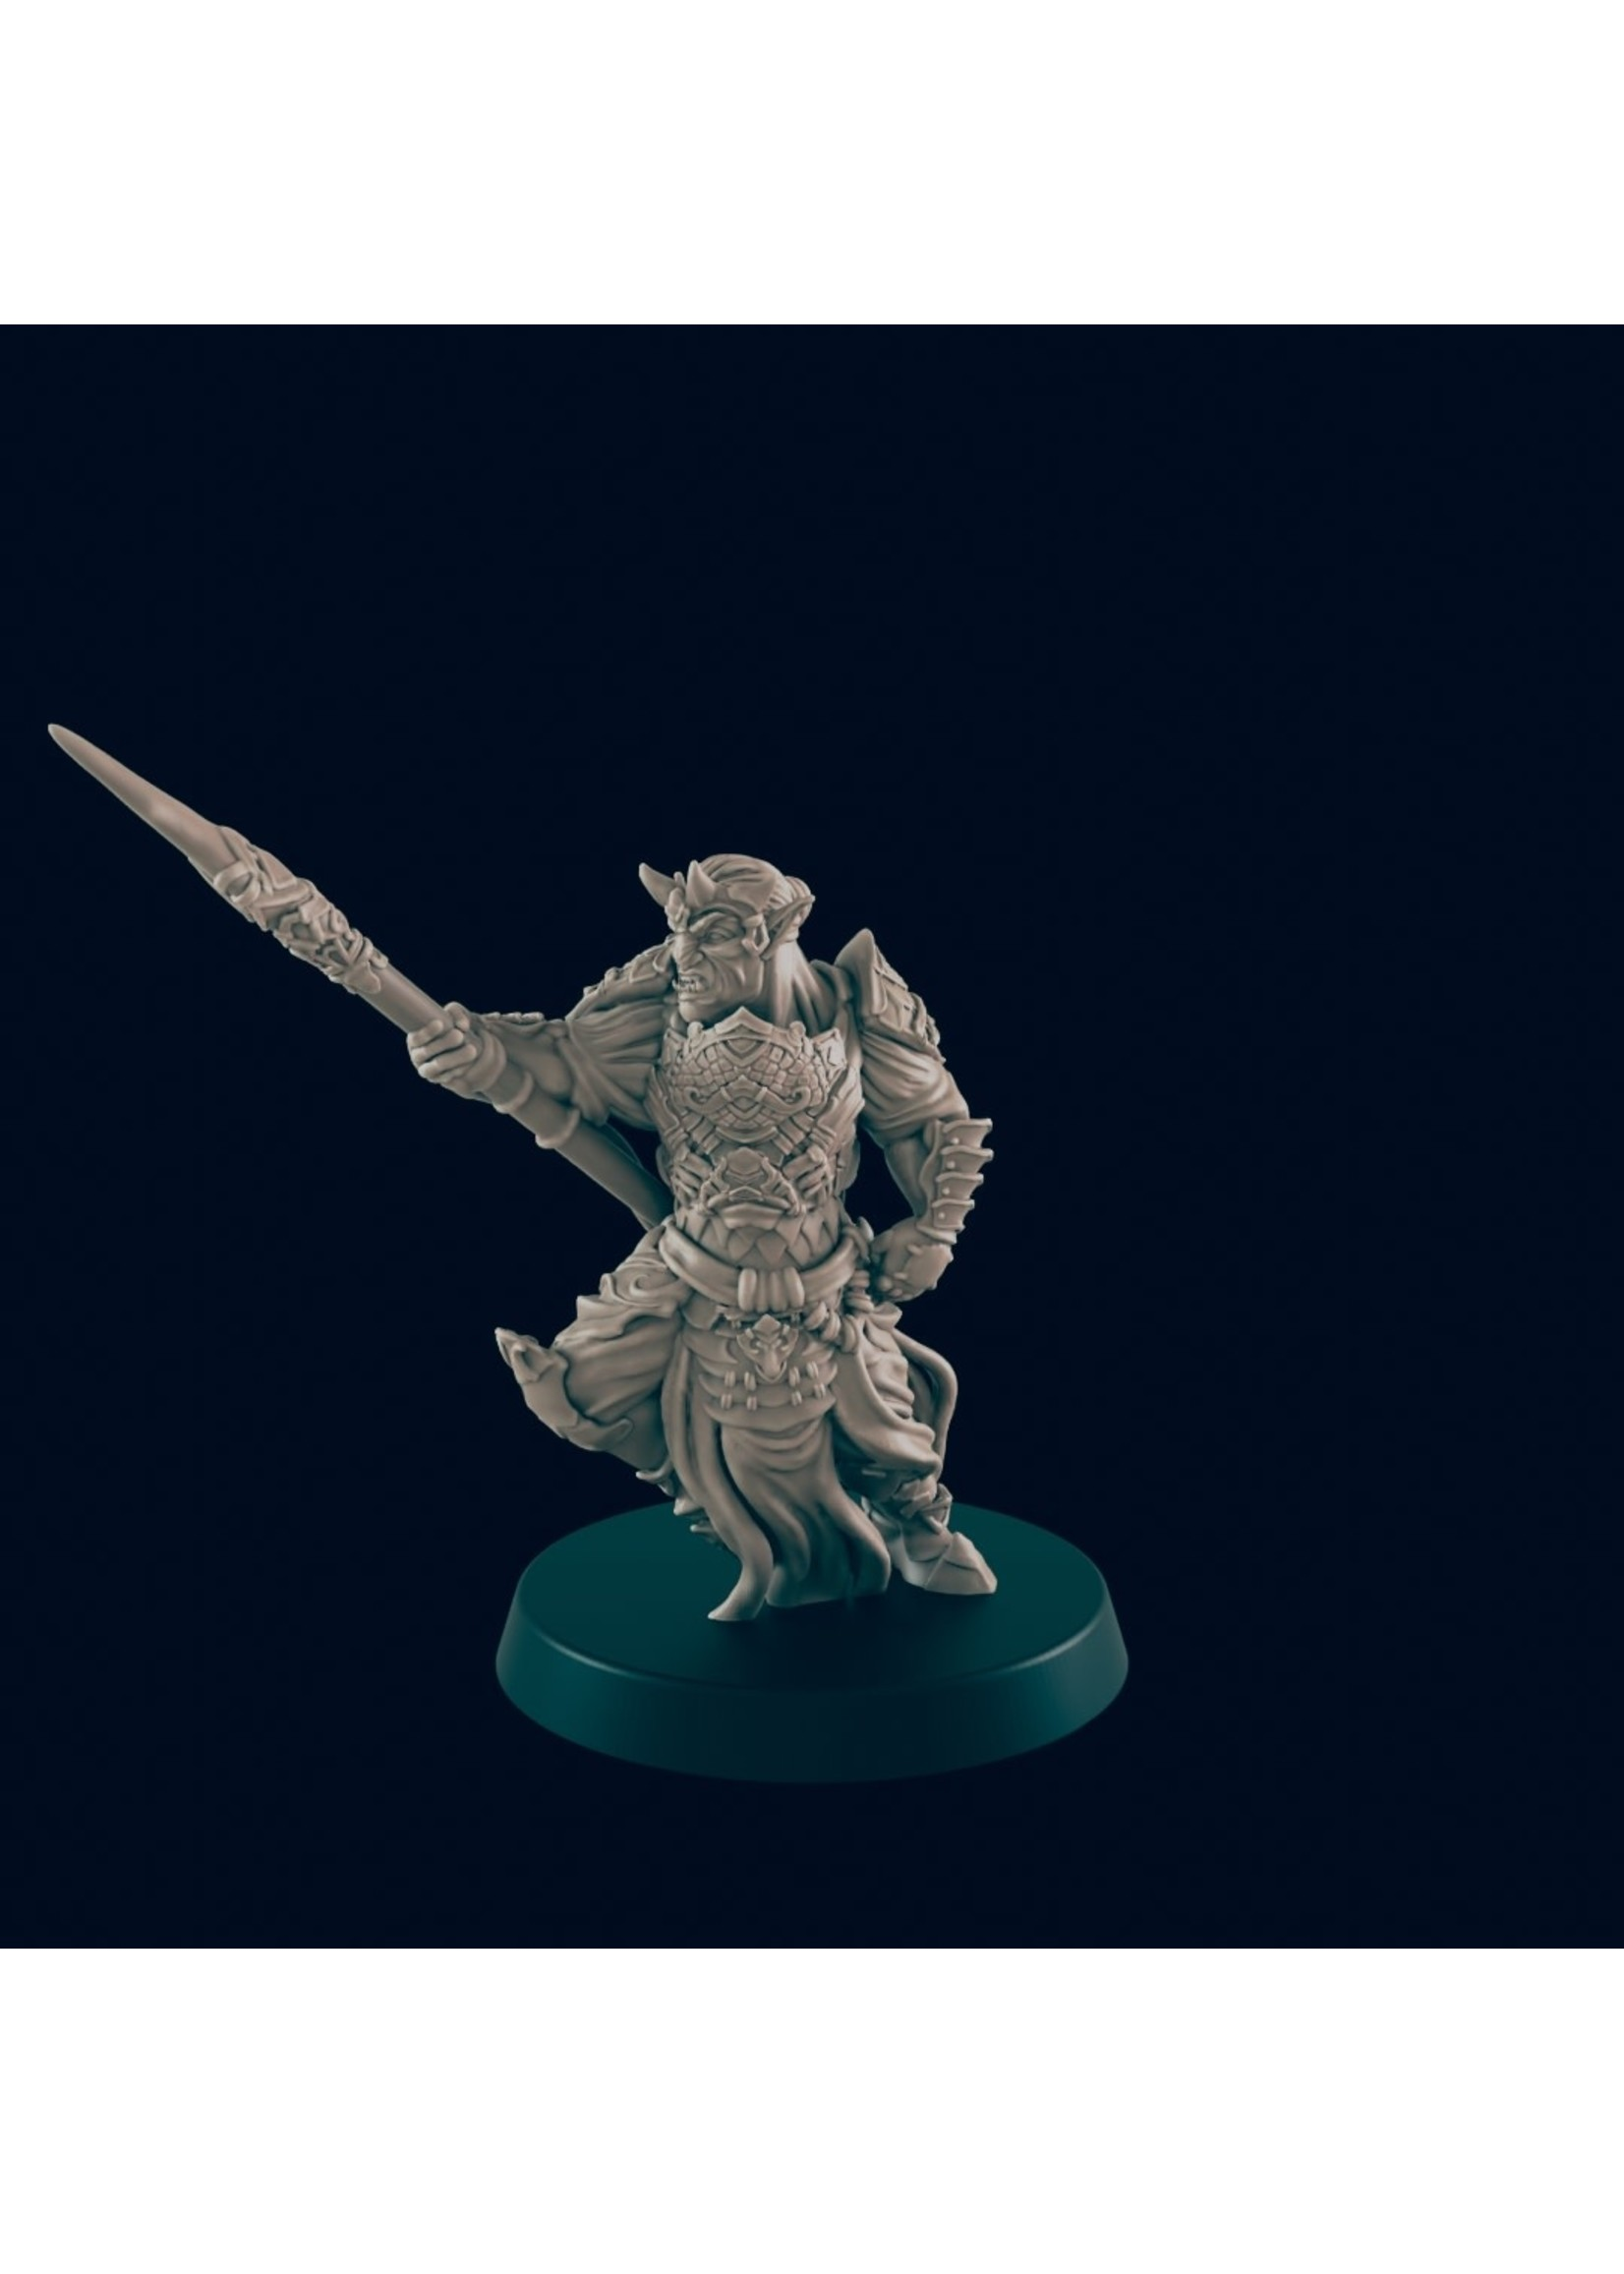 3D Printed Miniature - Hobgoblin 3 - Dungeons & Dragons - Beasts and Baddies KS